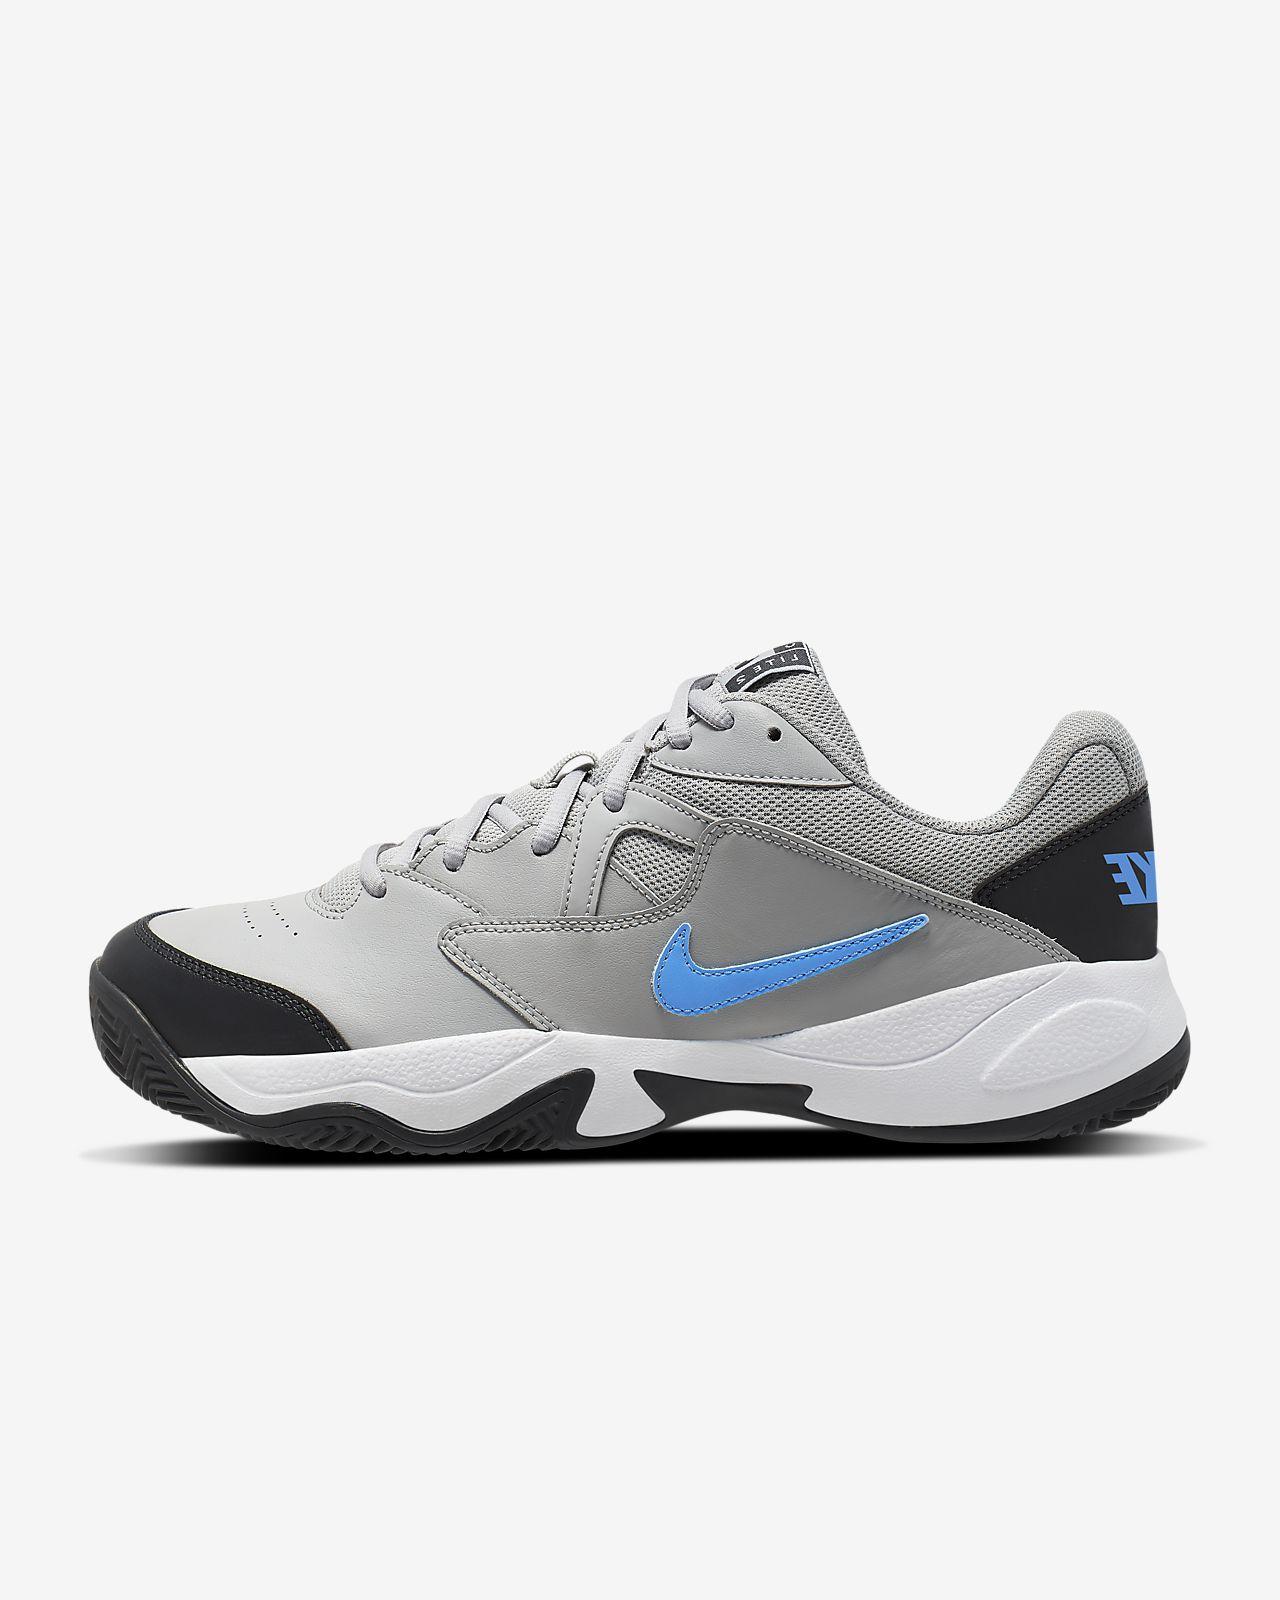 NikeCourt Lite 2 Men's Clay Tennis Shoe